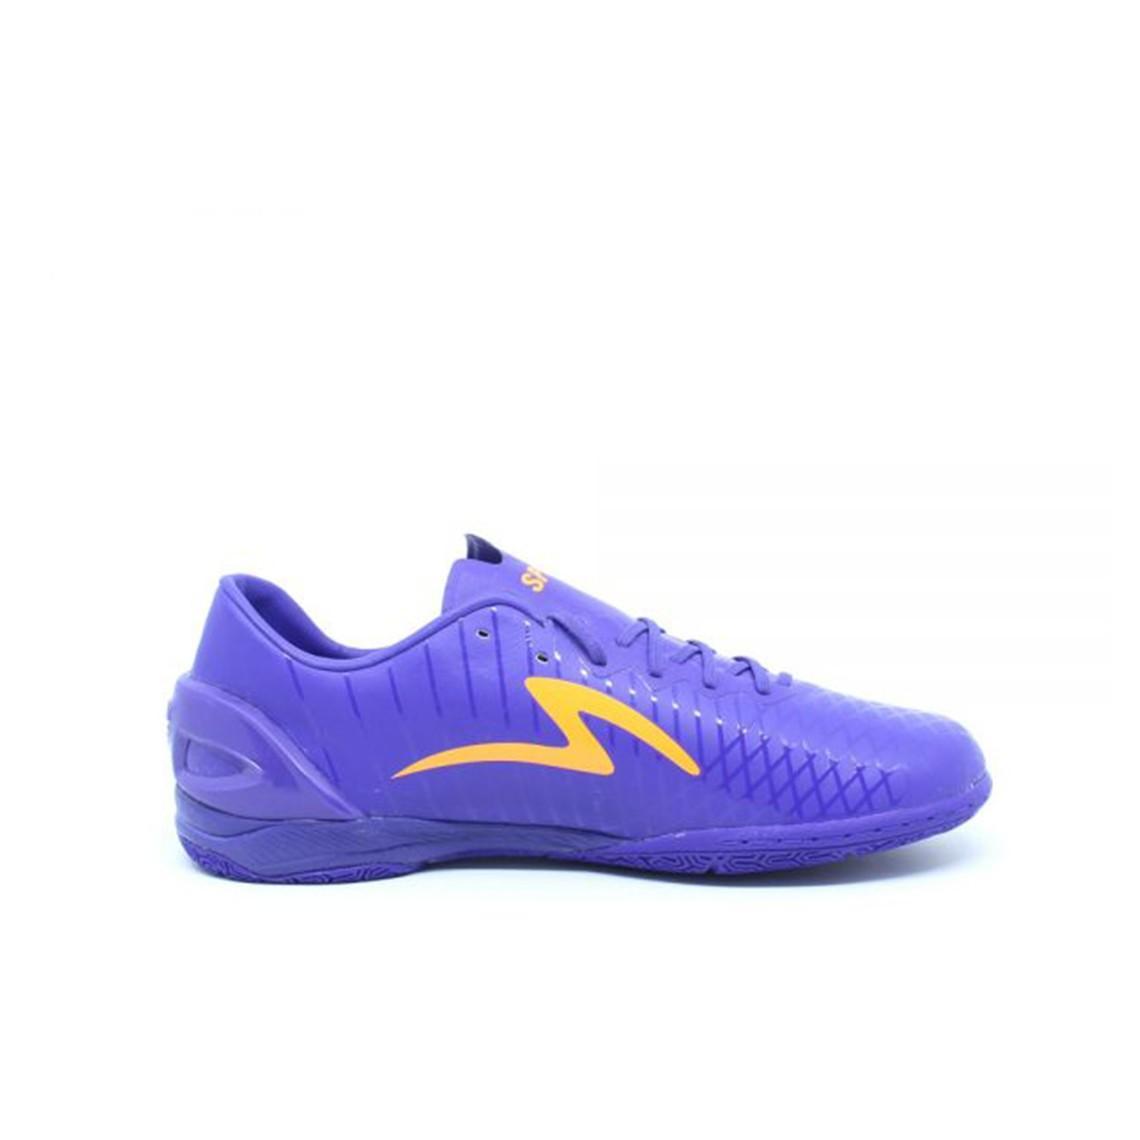 Specs Accelerator Exocet In Sepatu Olahraga Futsal Pria - Deep Blue 53553f4fff